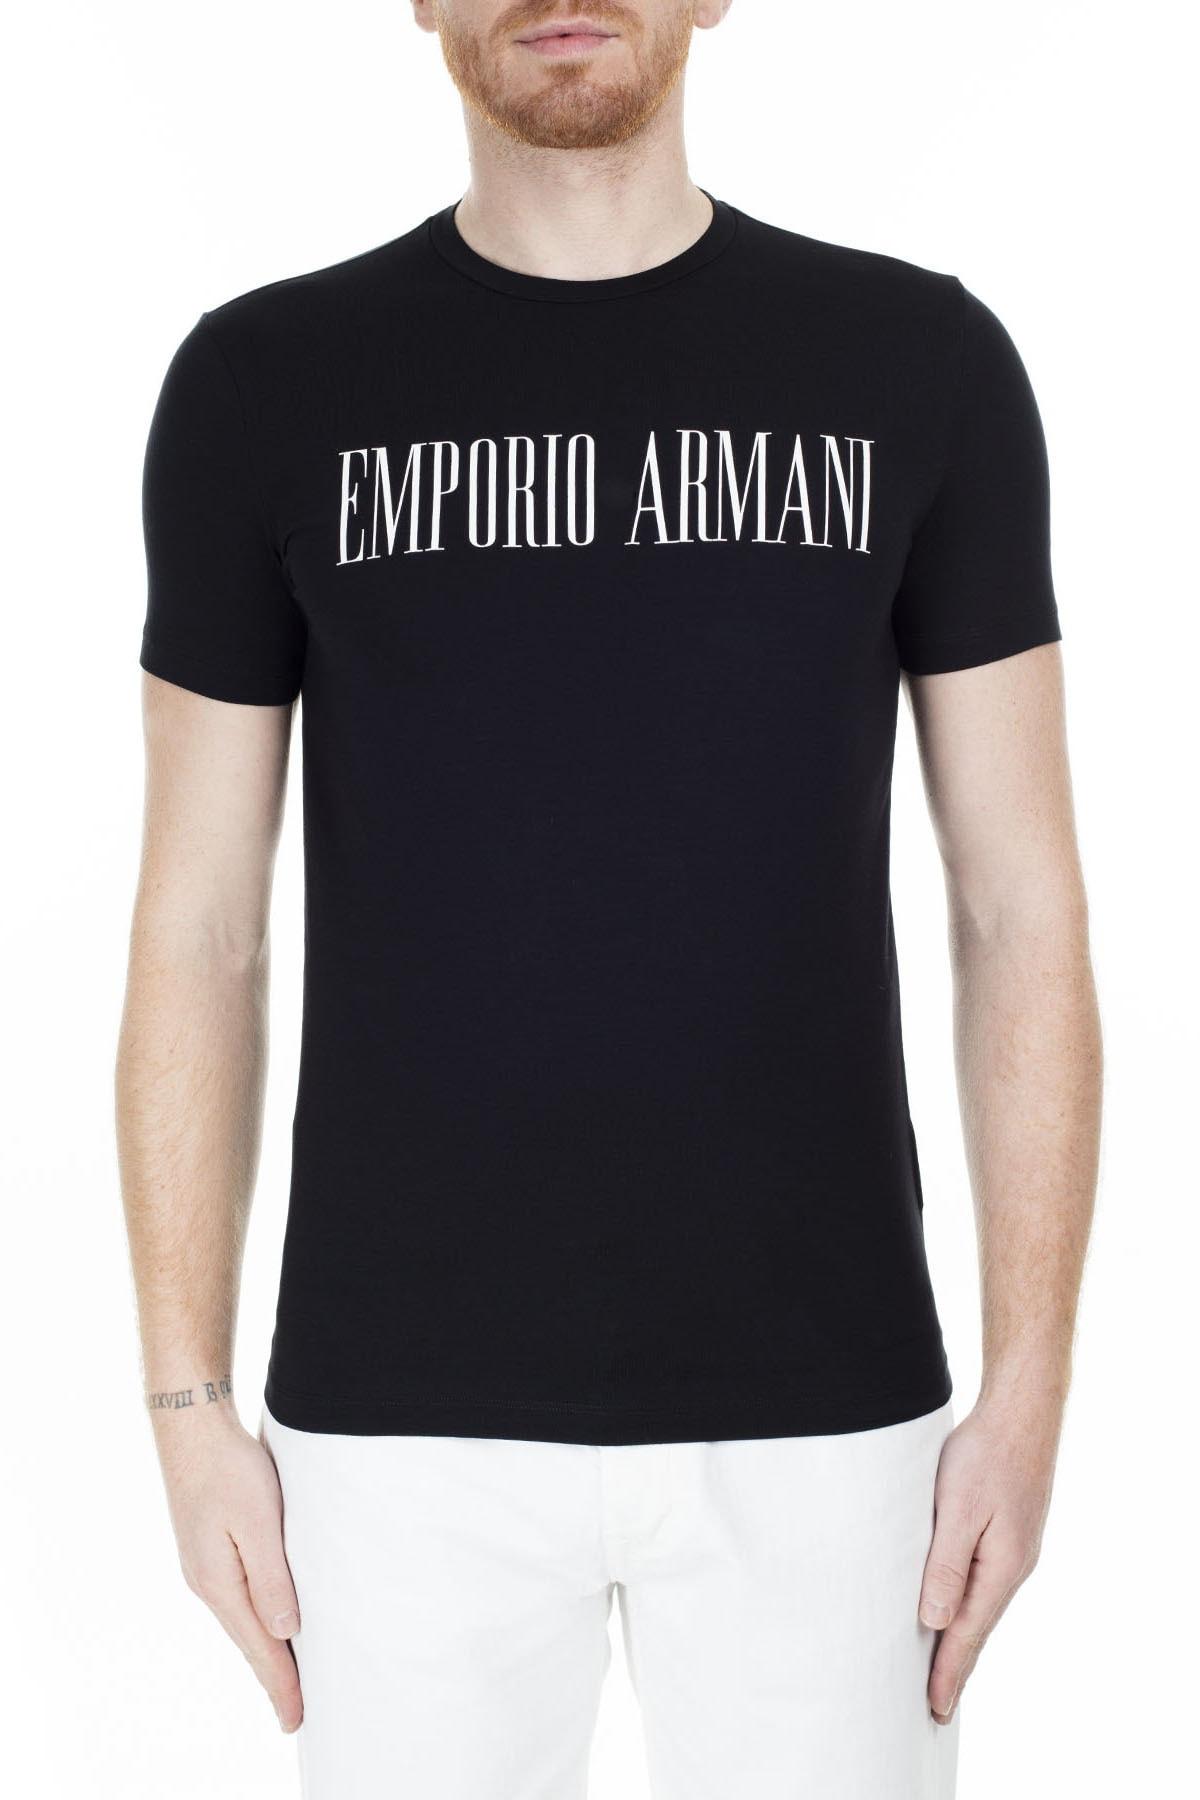 Emporio Armani Regular Fit T Shirt Erkek T Shirt S 6G1Td5 1J0Az 0002 S 6G1TD5 1J0AZ 0002